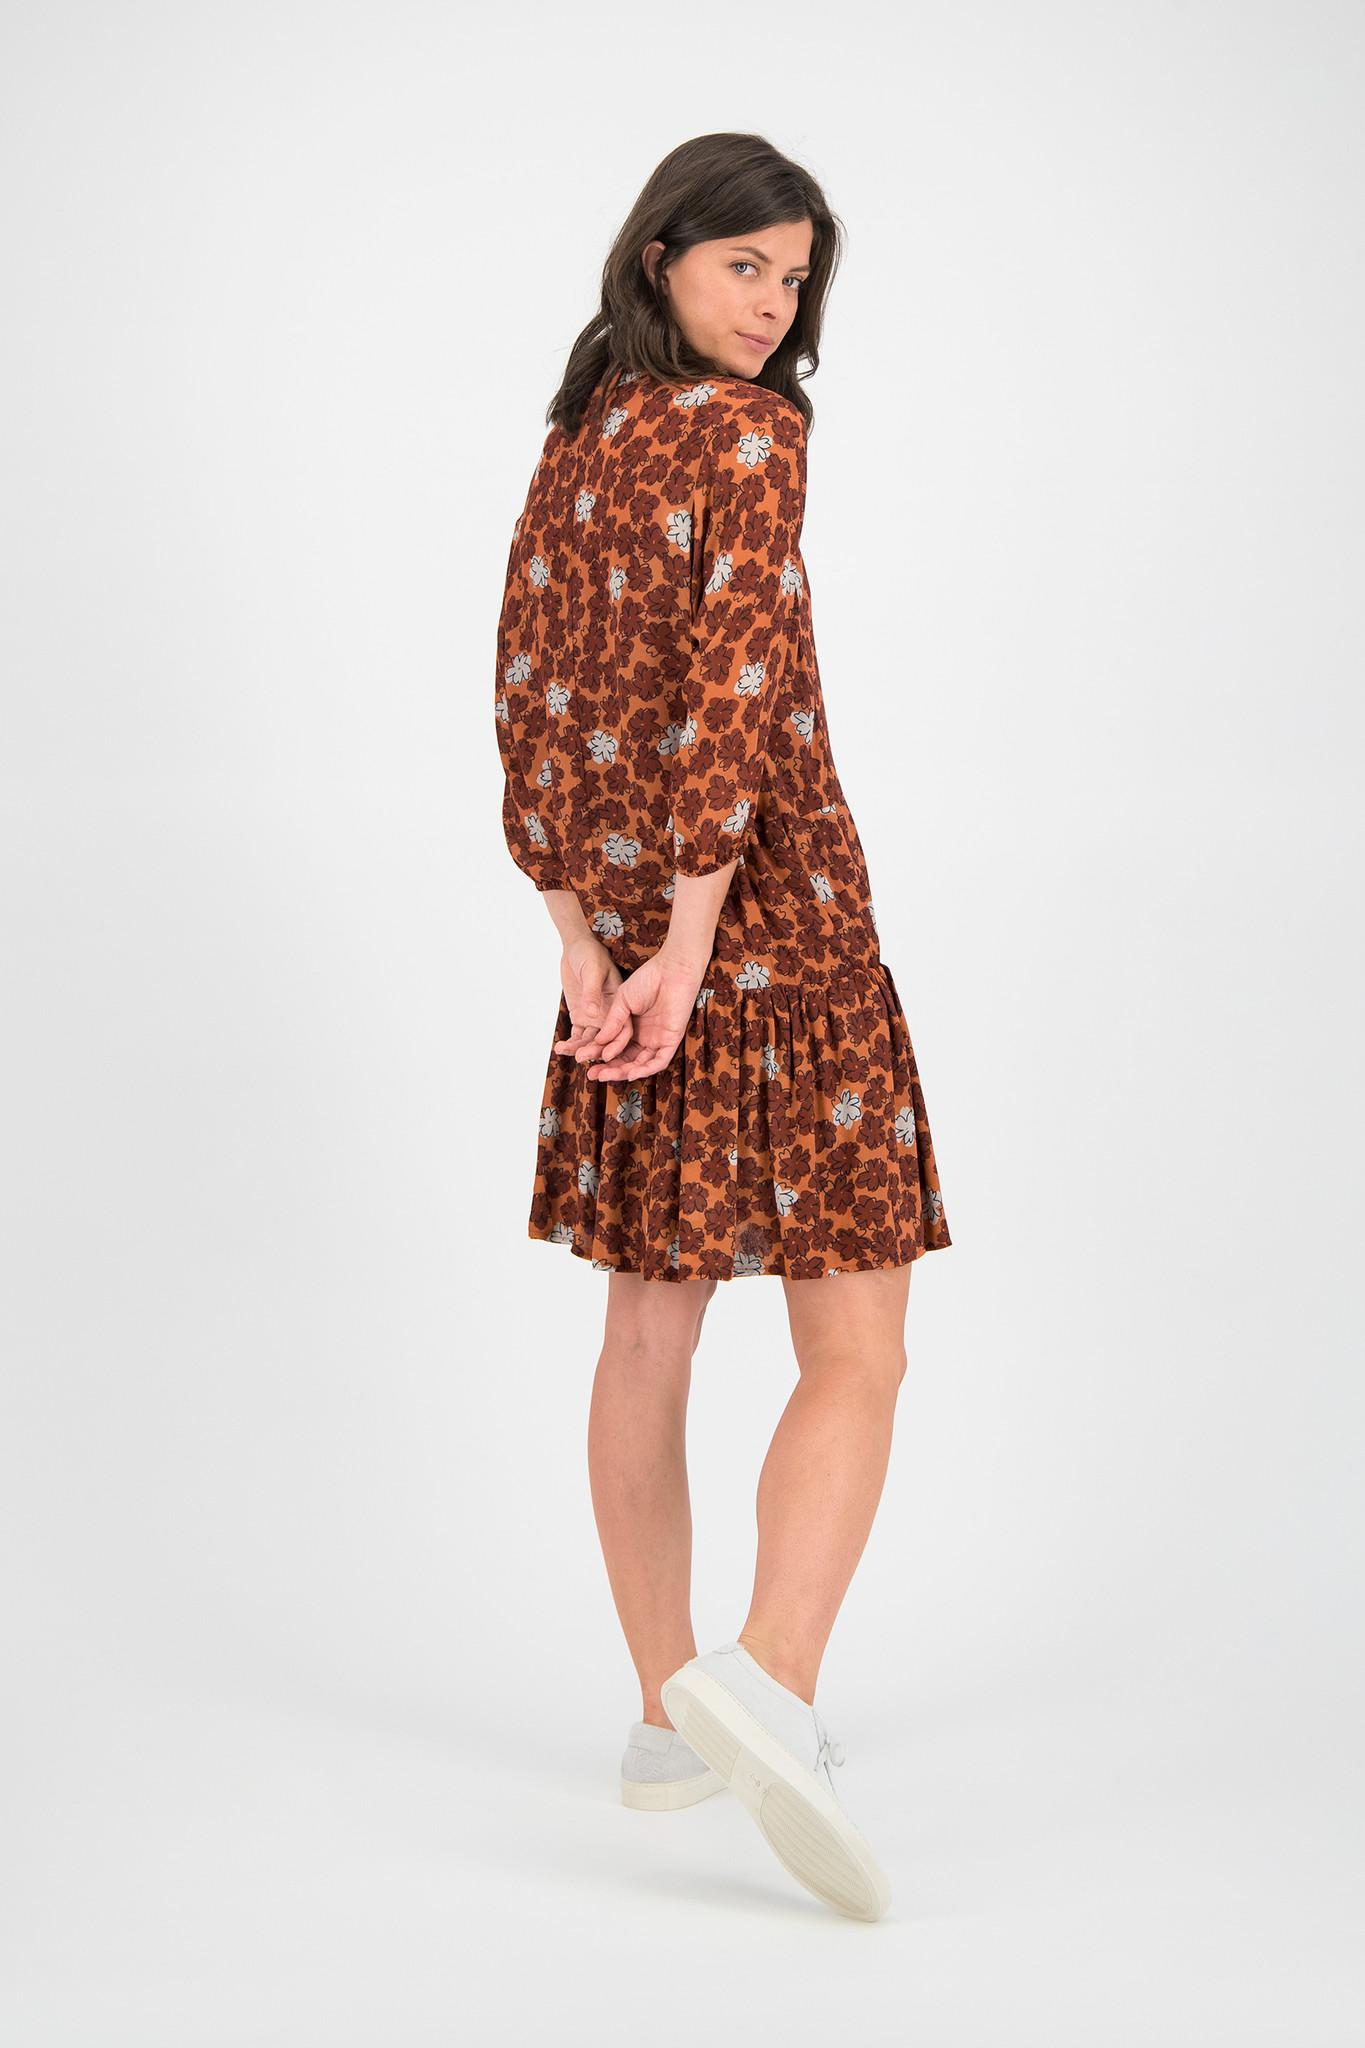 SYLVER Sketch Flowers Dress - Burnt Orange